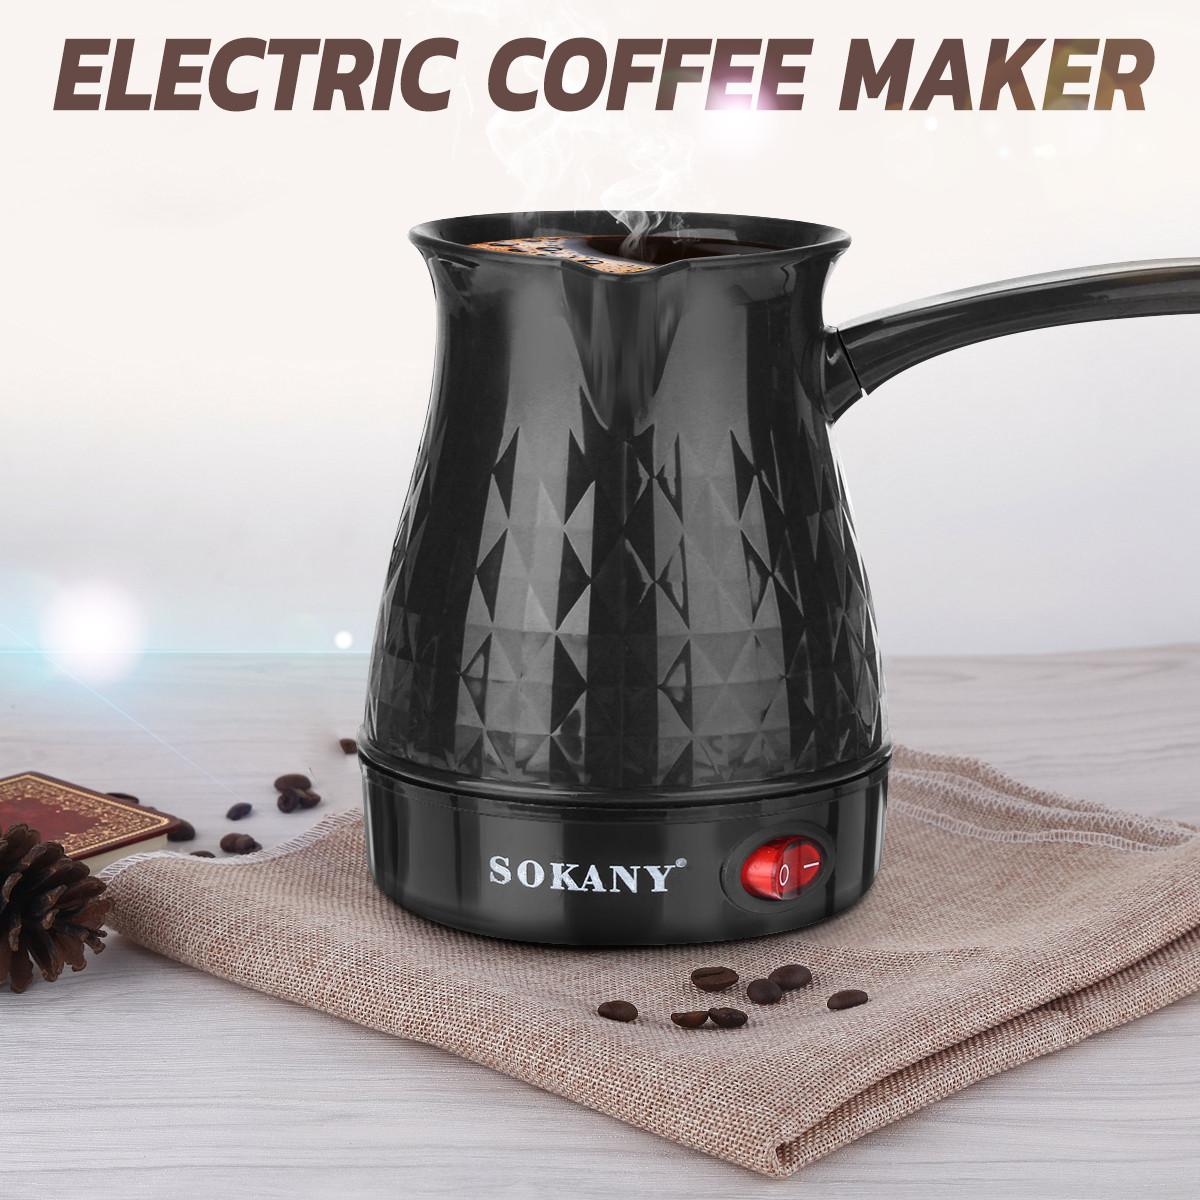 500ml Coffee Maker 600W Electric Coffee Percolato Coffee Pot Portable Espresso Machine Fast Heat Resistant EU Plug Waterproof